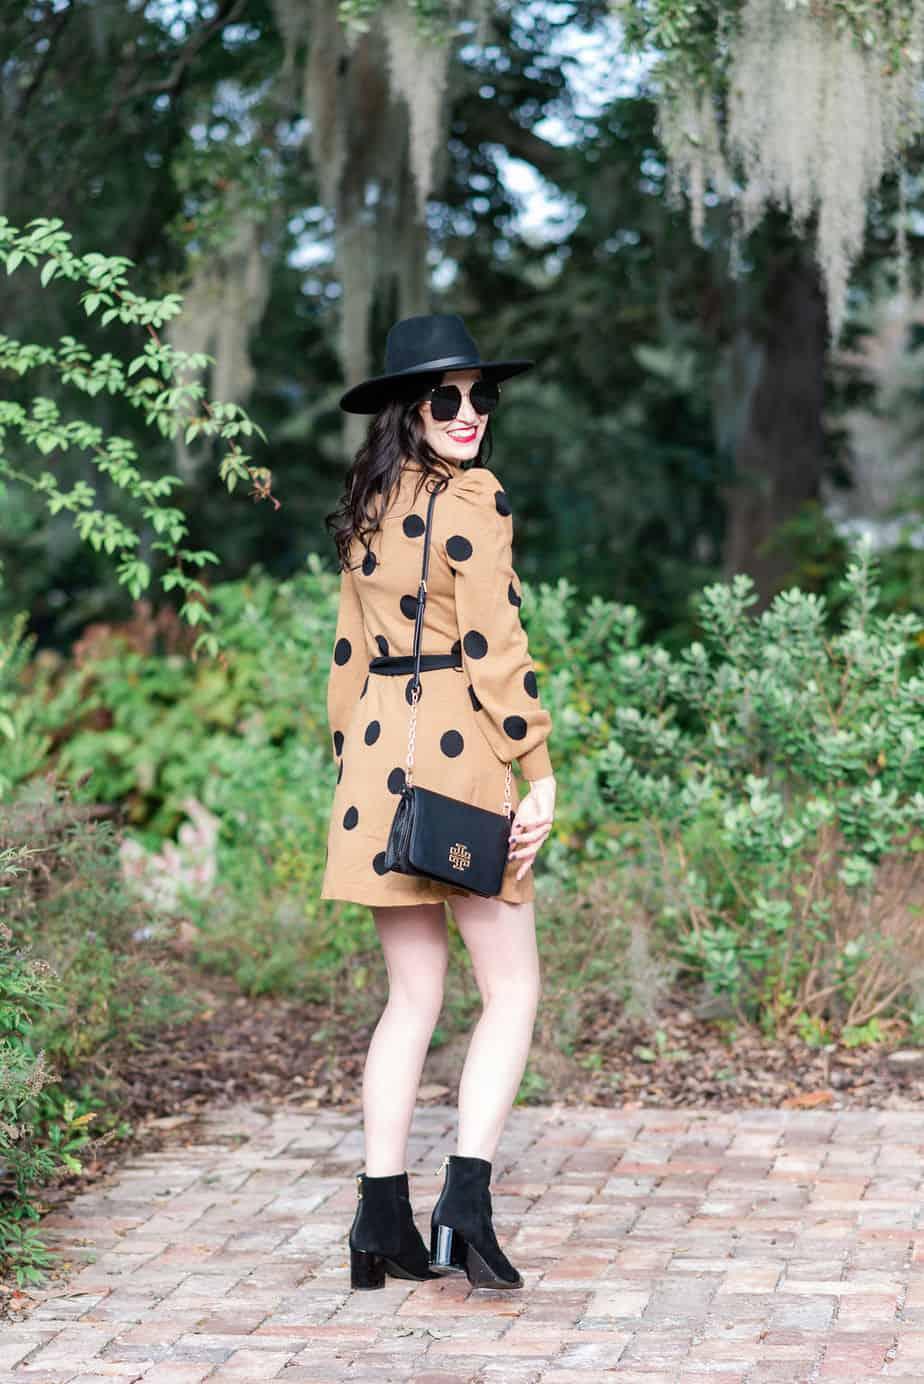 sweater-dress-polka-dot-tory-burch-crossbody